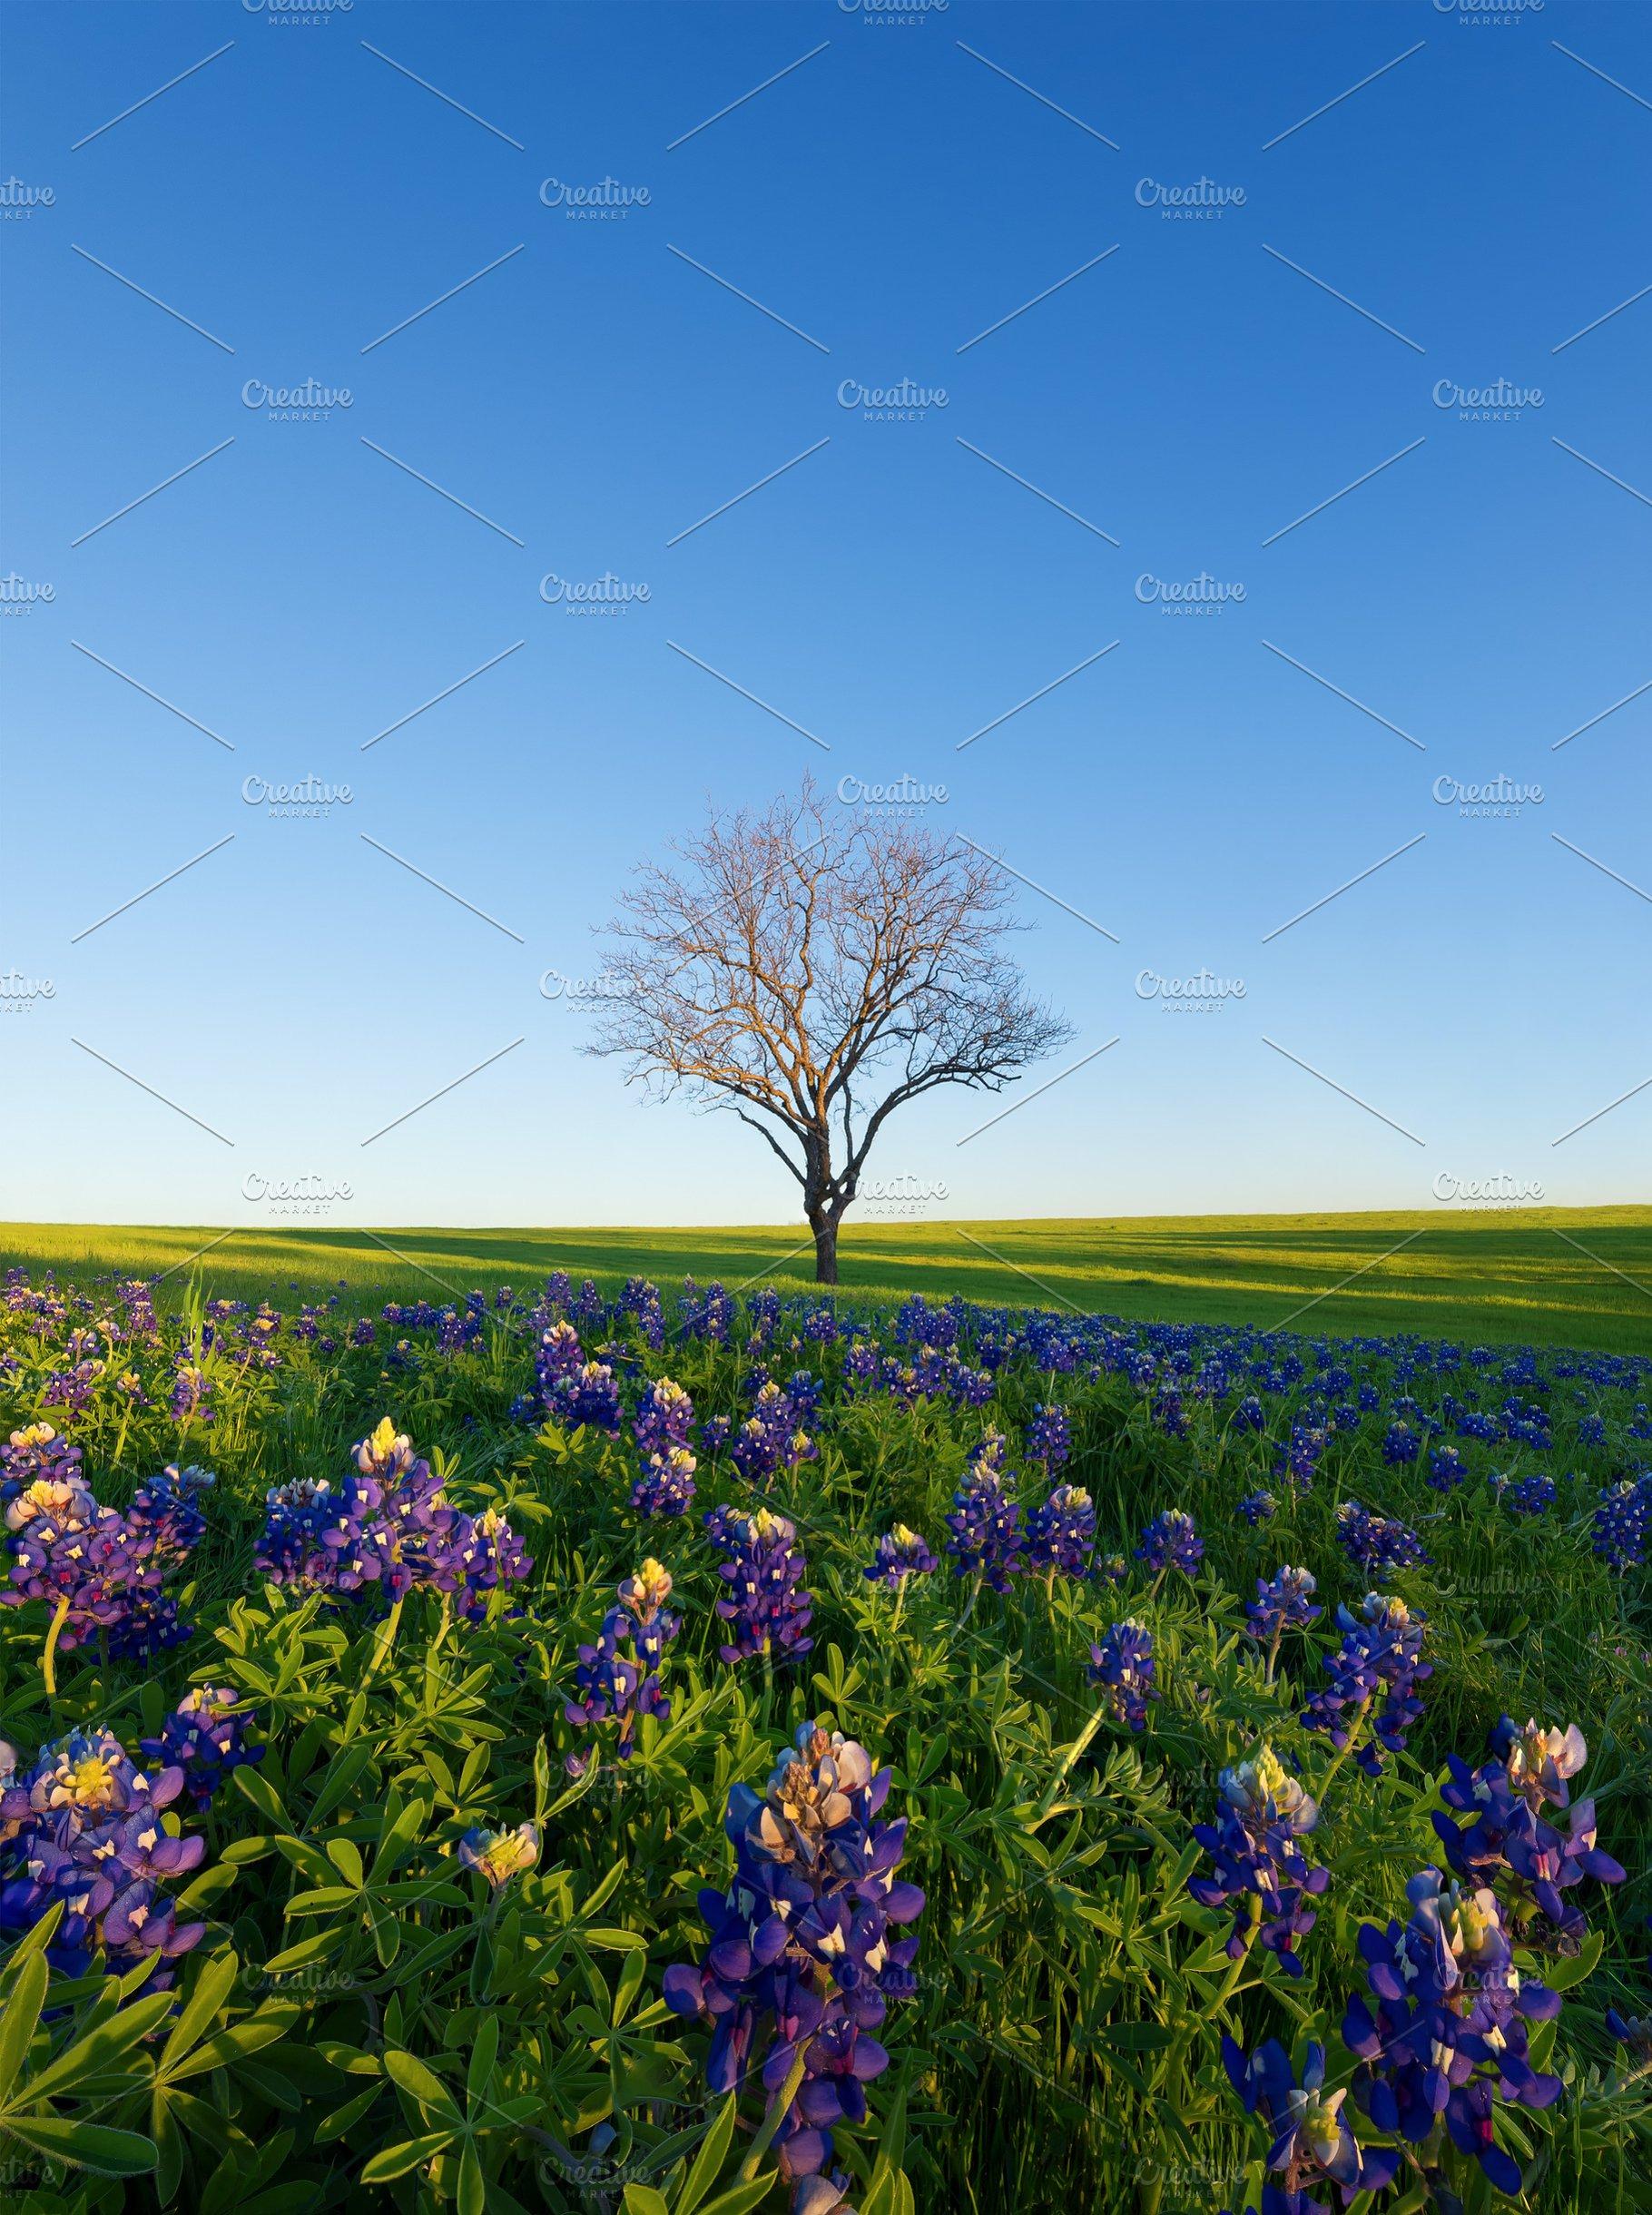 A Blue Bonnet Field Ennis Texas High Quality Architecture